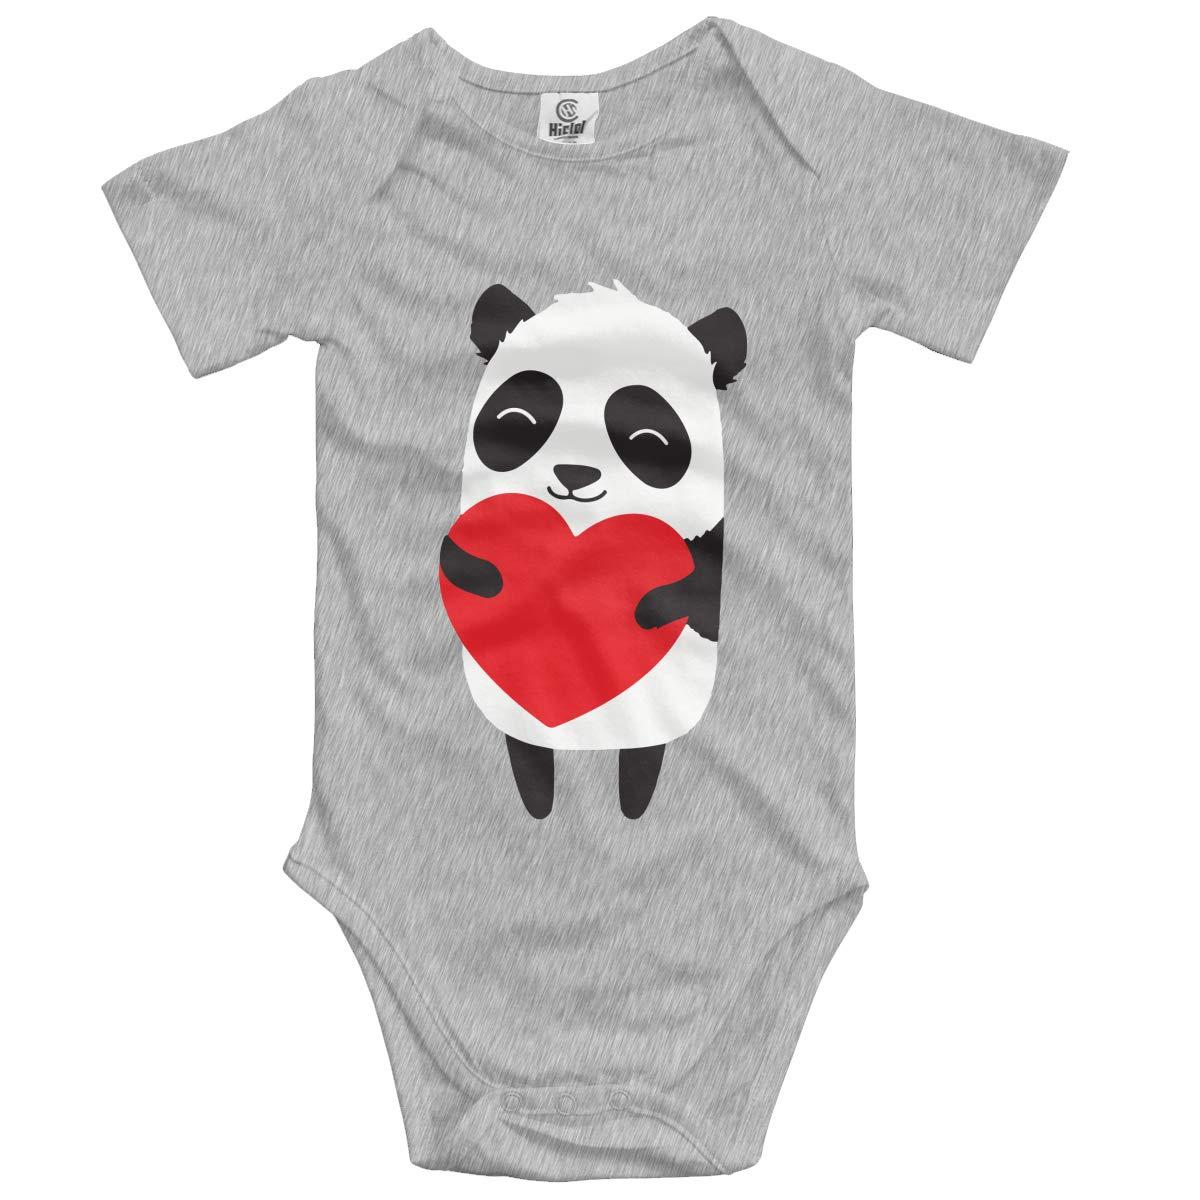 Cartoon Panda Holding Heart Kids Girl Boy 100/% Organic Cotton Rompers Costume Jumpsuit 0-2T